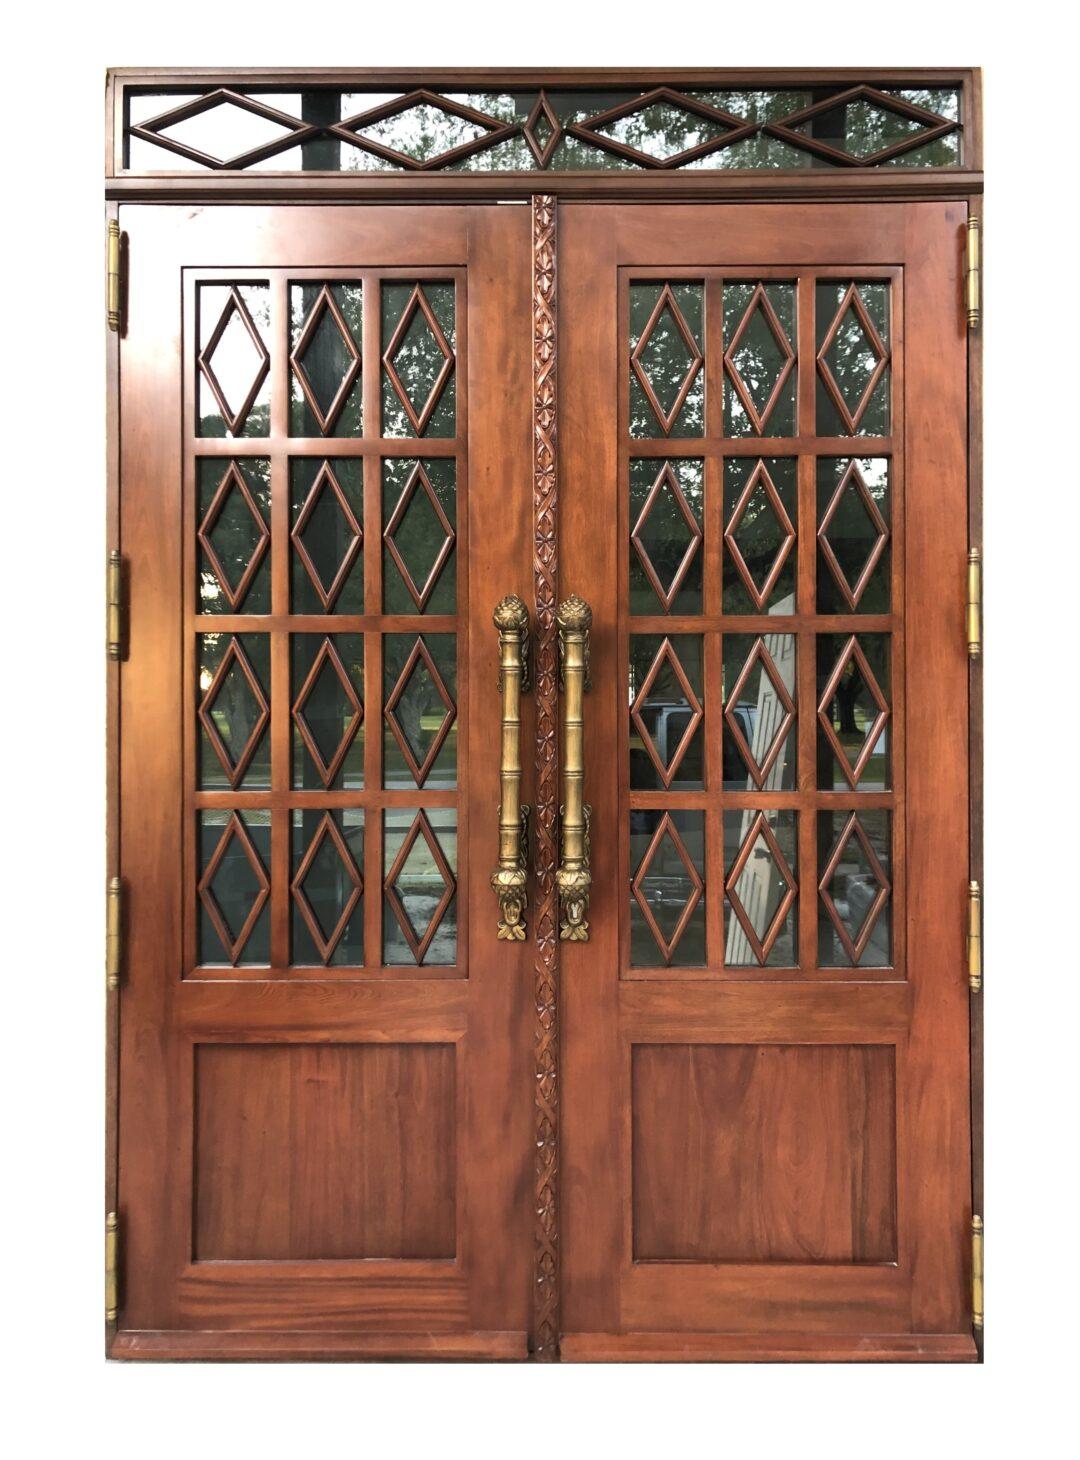 Paradiso Mahogany Entry Gate Door | https://bellinimastercraft.com/